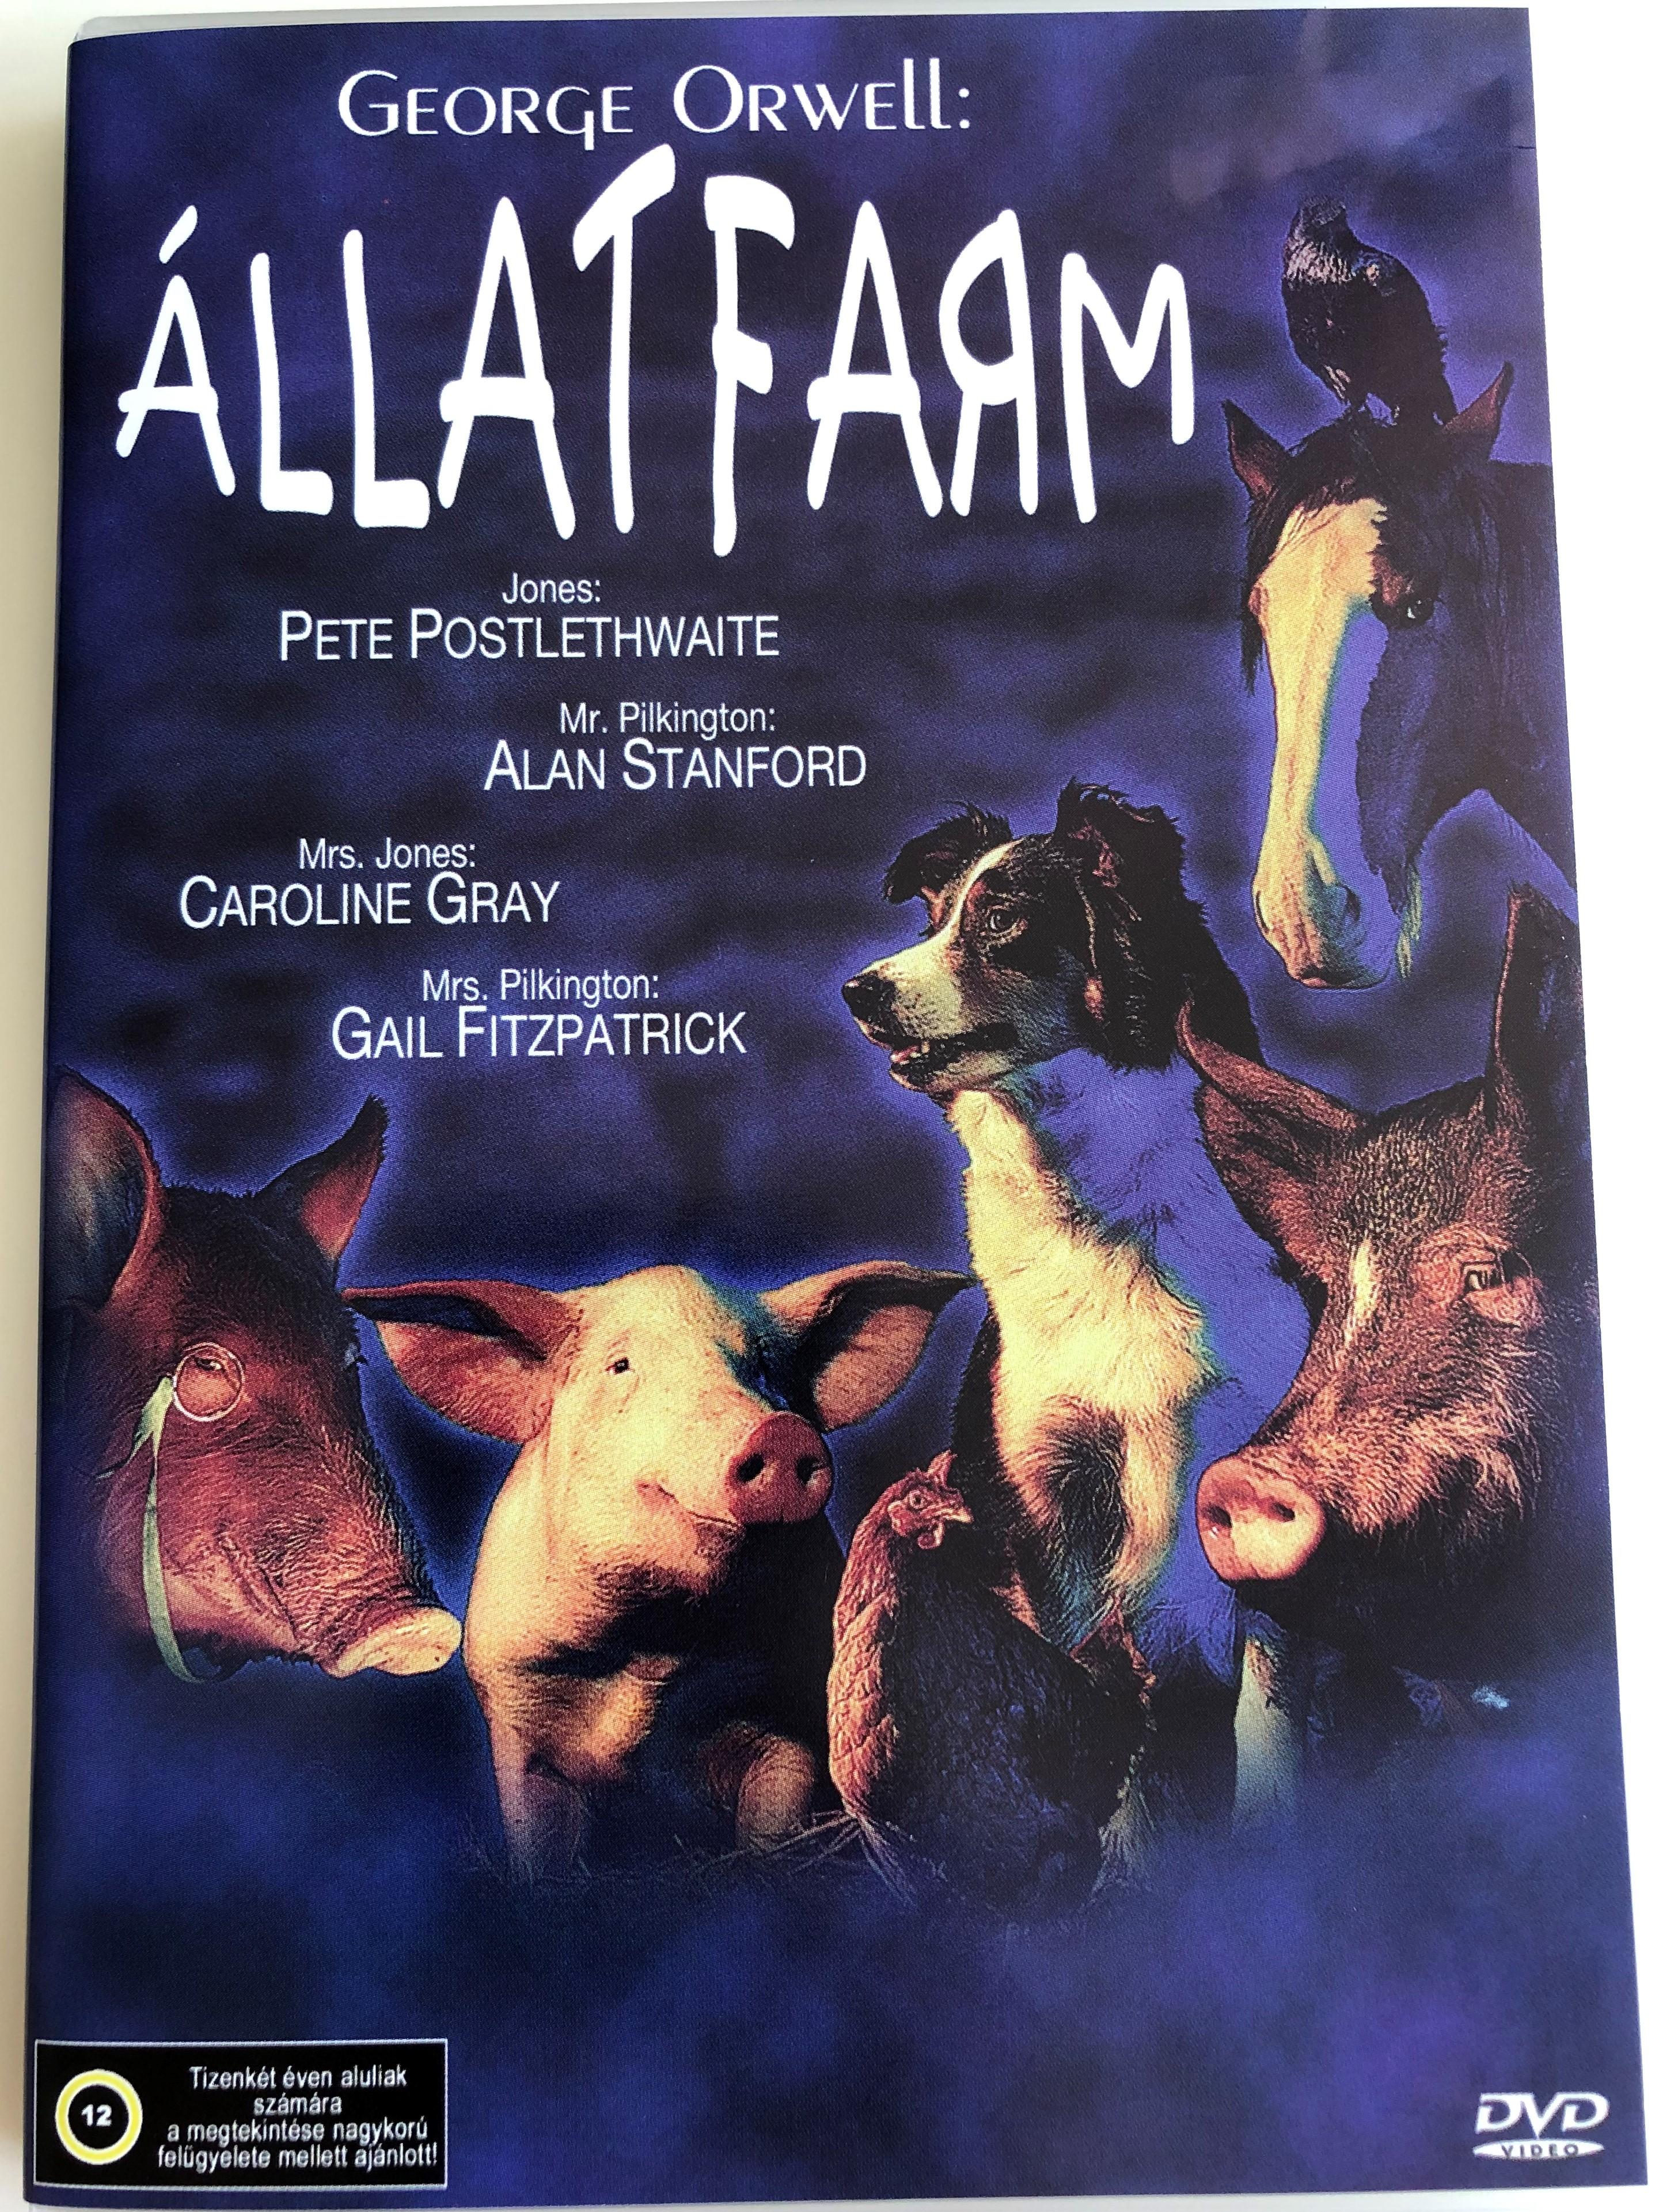 george-orwell-s-animal-farm-dvd-1999-llatfarm-directed-by-john-stephenson-starring-pete-postlethwaite-alan-stanford-caroline-gray-gail-fitzpatrick-1-.jpg